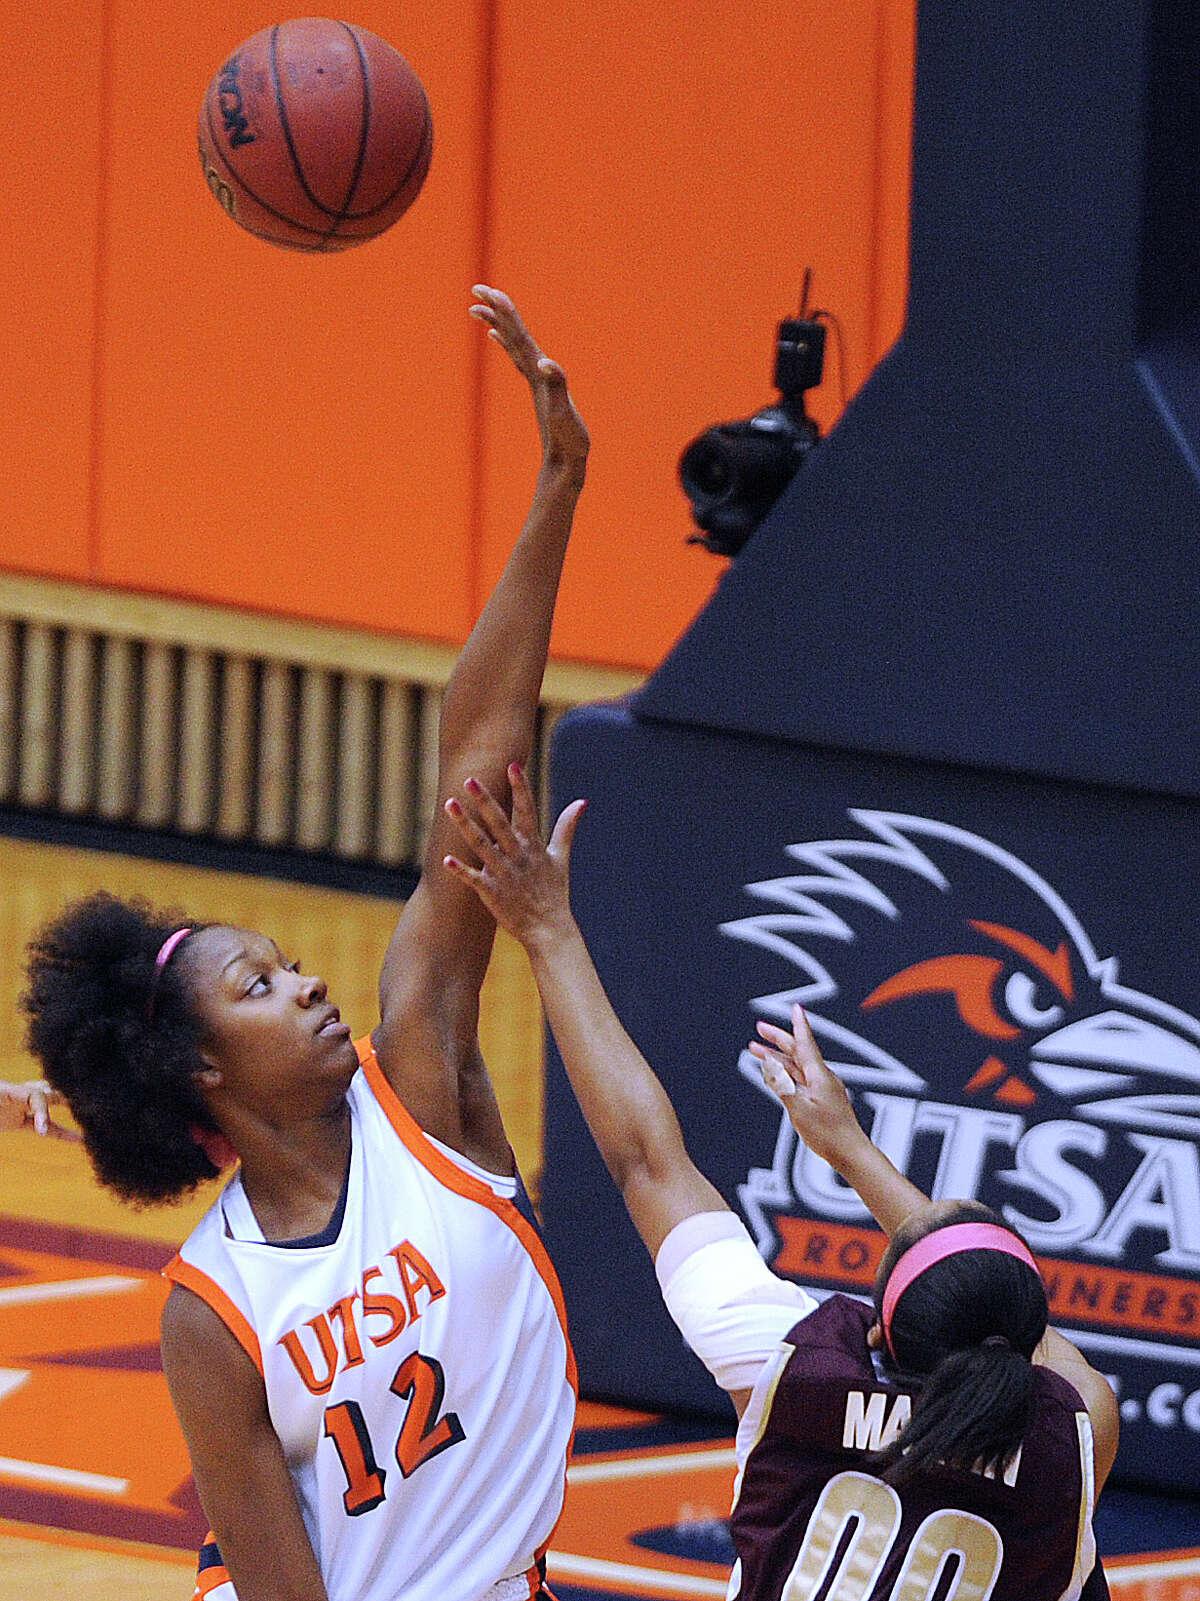 Niaga Mitchell-Cole of UTSA (12) blocks a shot by Kaylan Martin of Texas State during women's college basketball action at UTSA on Saturday, Feb. 16, 2013.